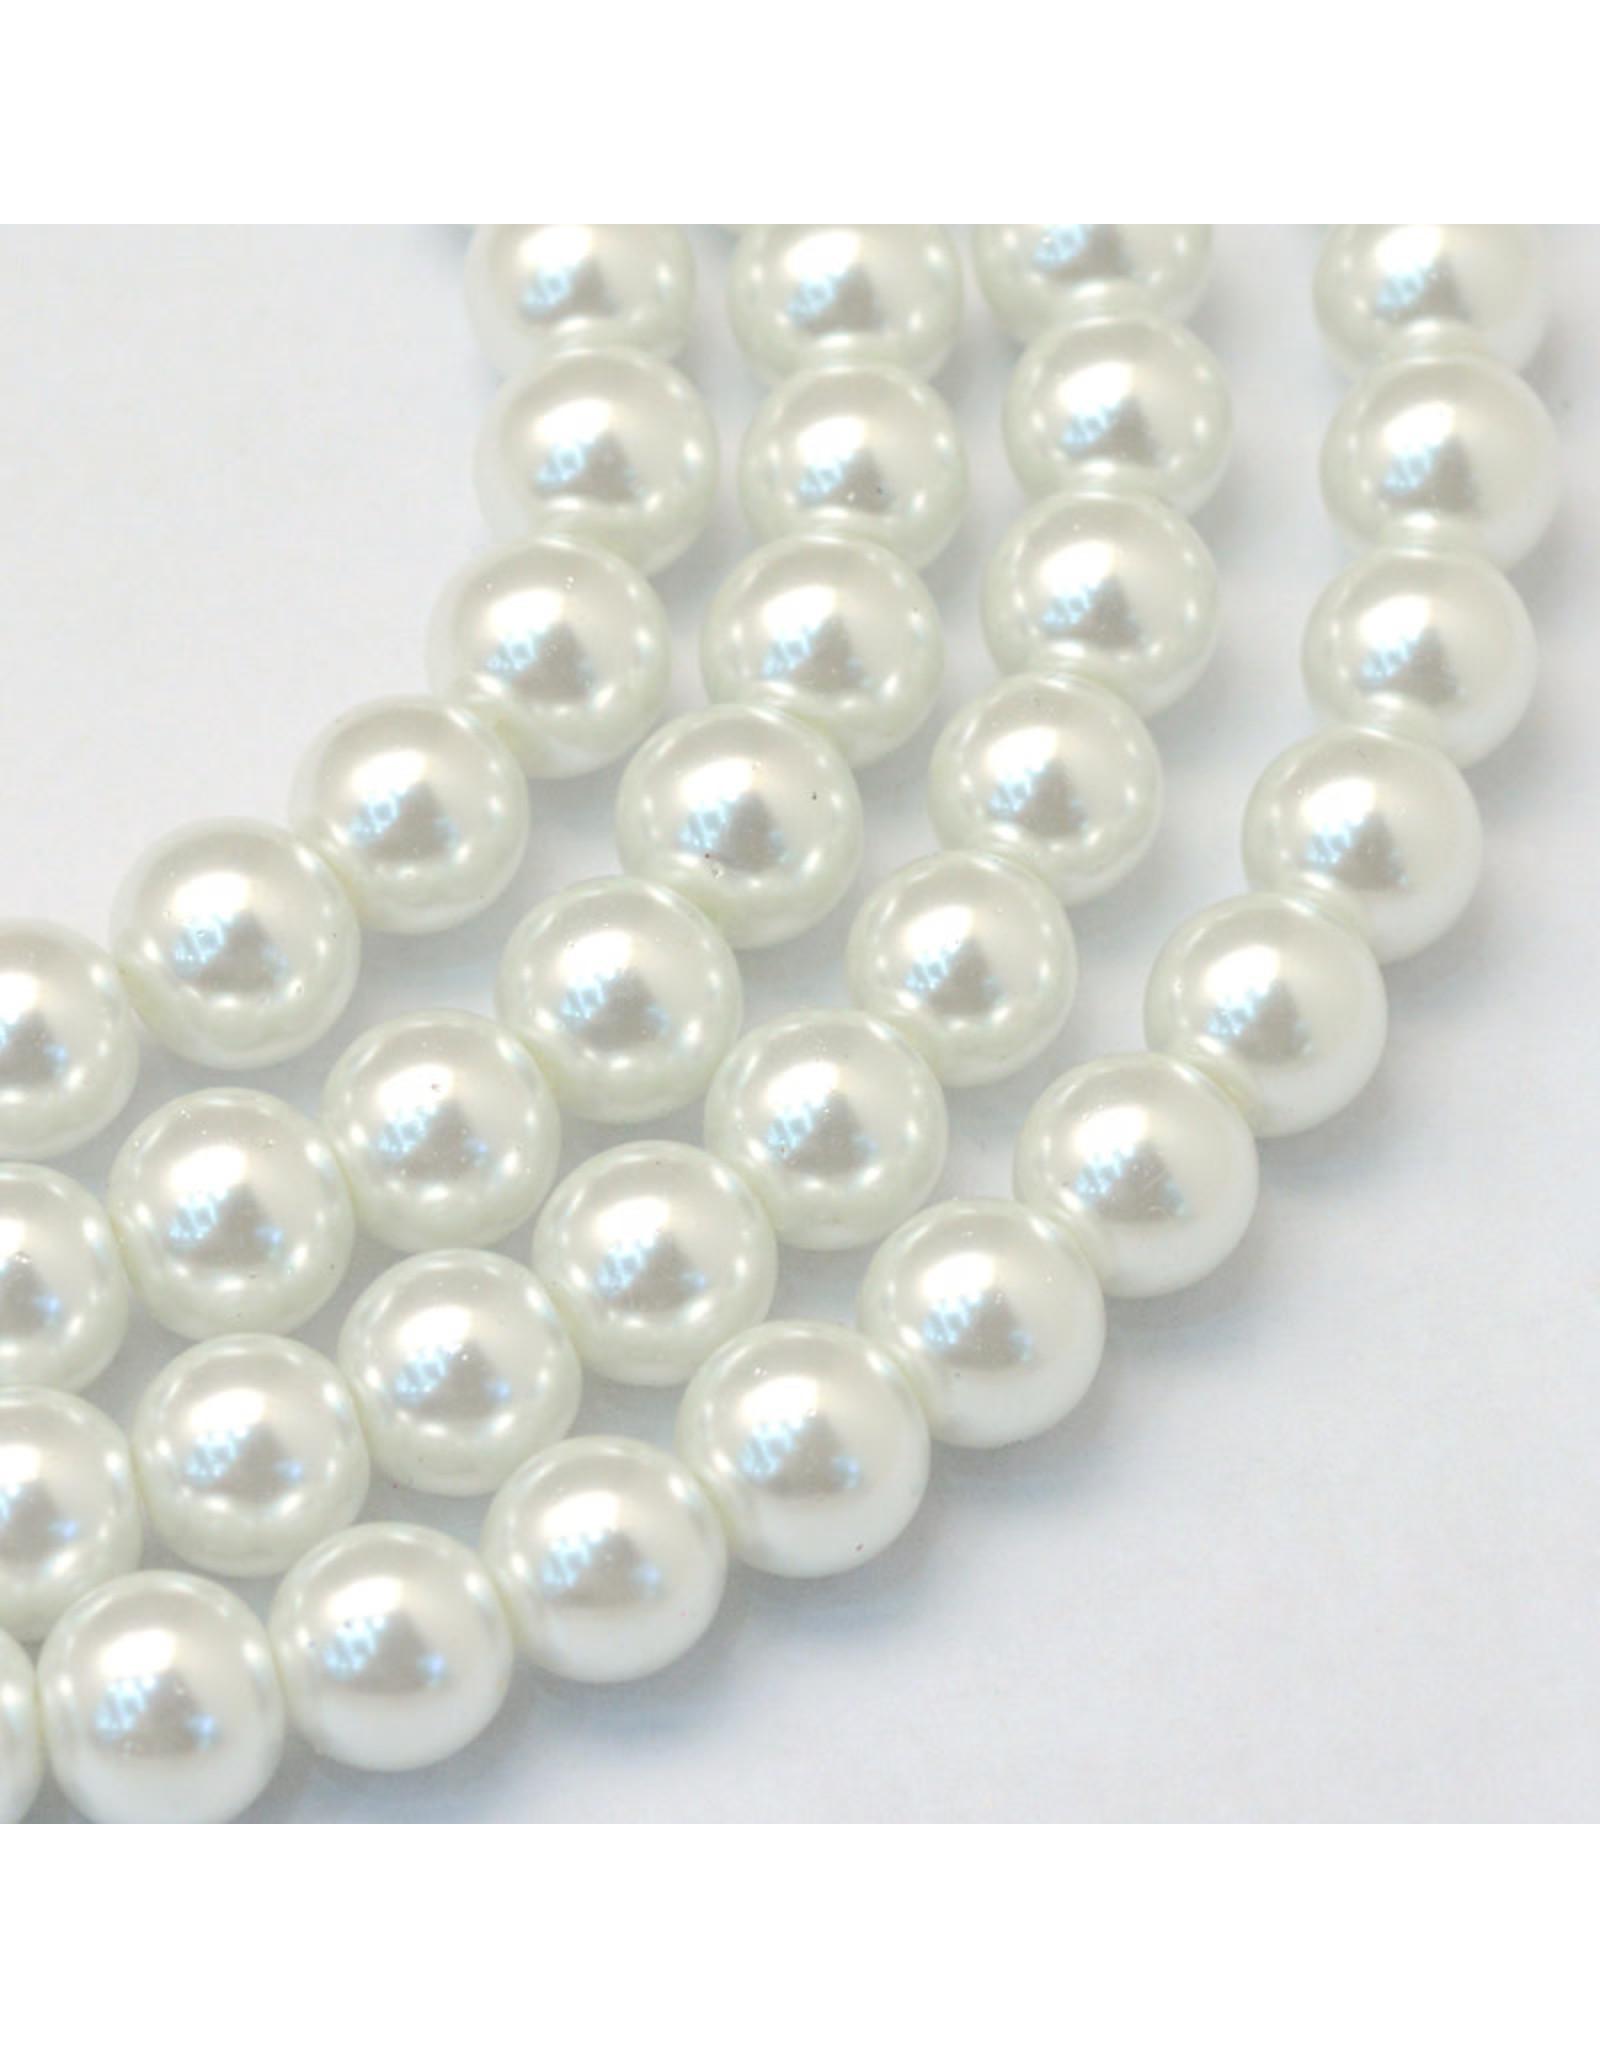 3mm Round Glass Pearl White  x195